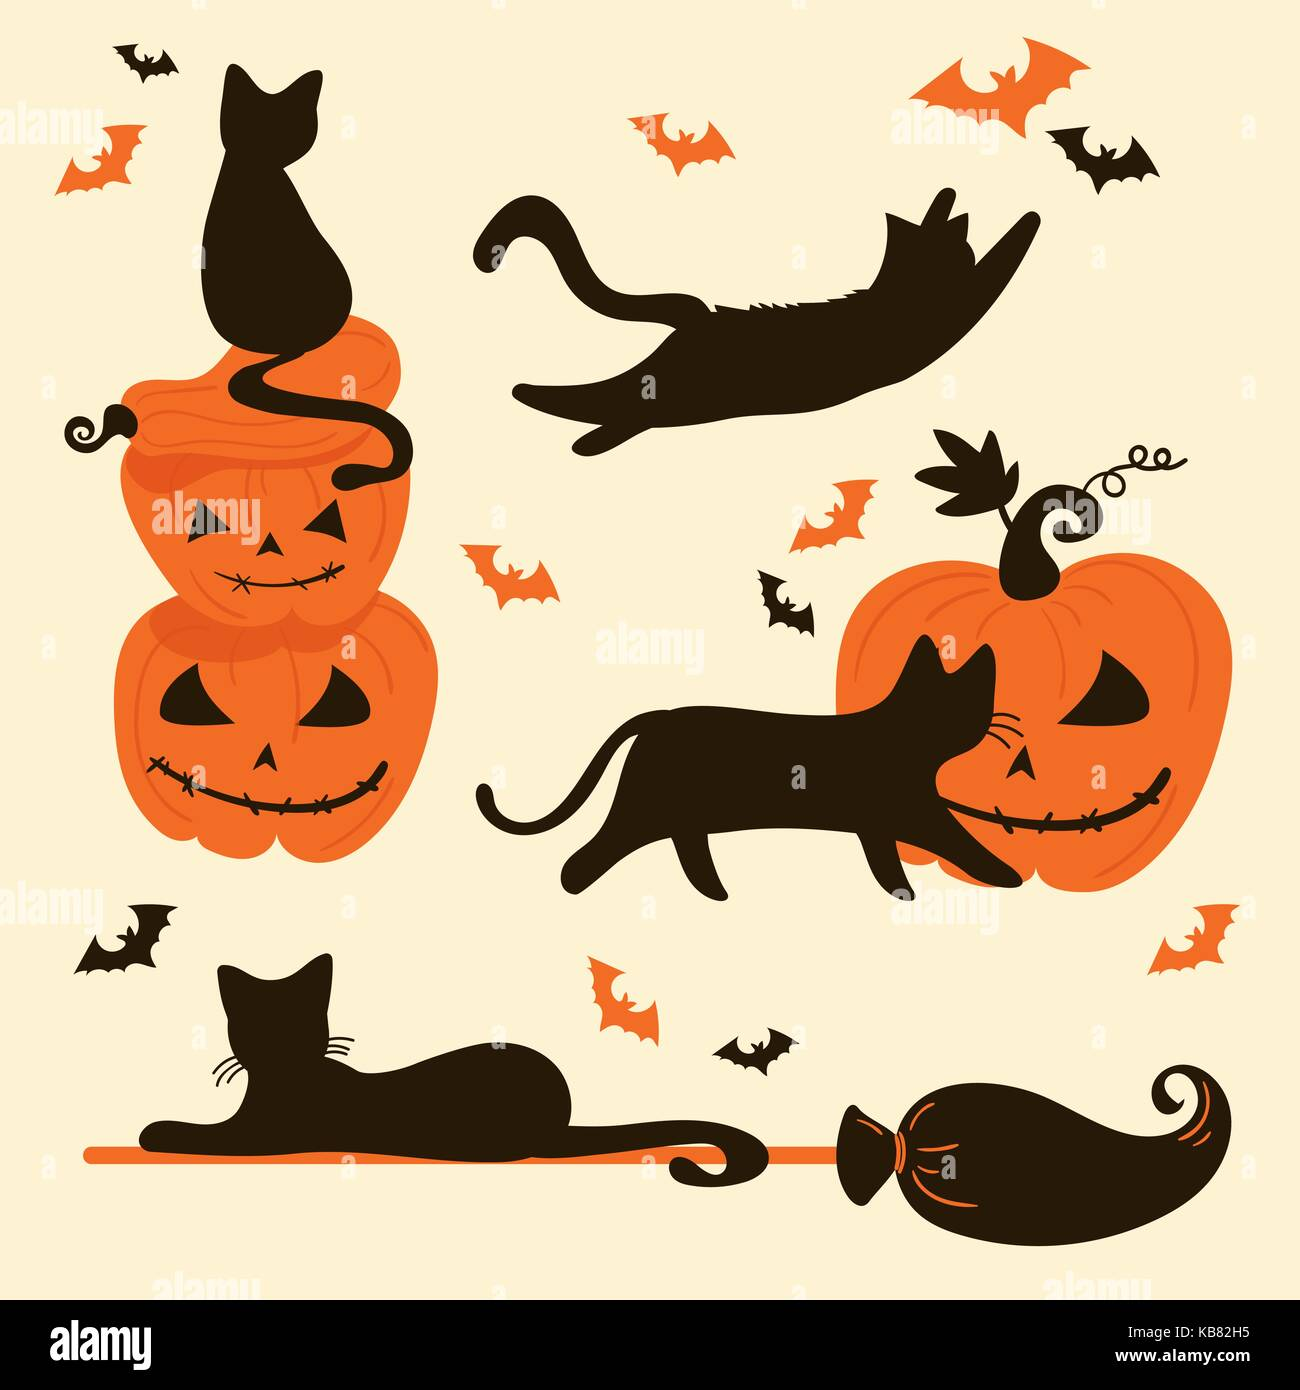 Atemberaubend Halloween Katze Farbseite Ideen - Entry Level Resume ...